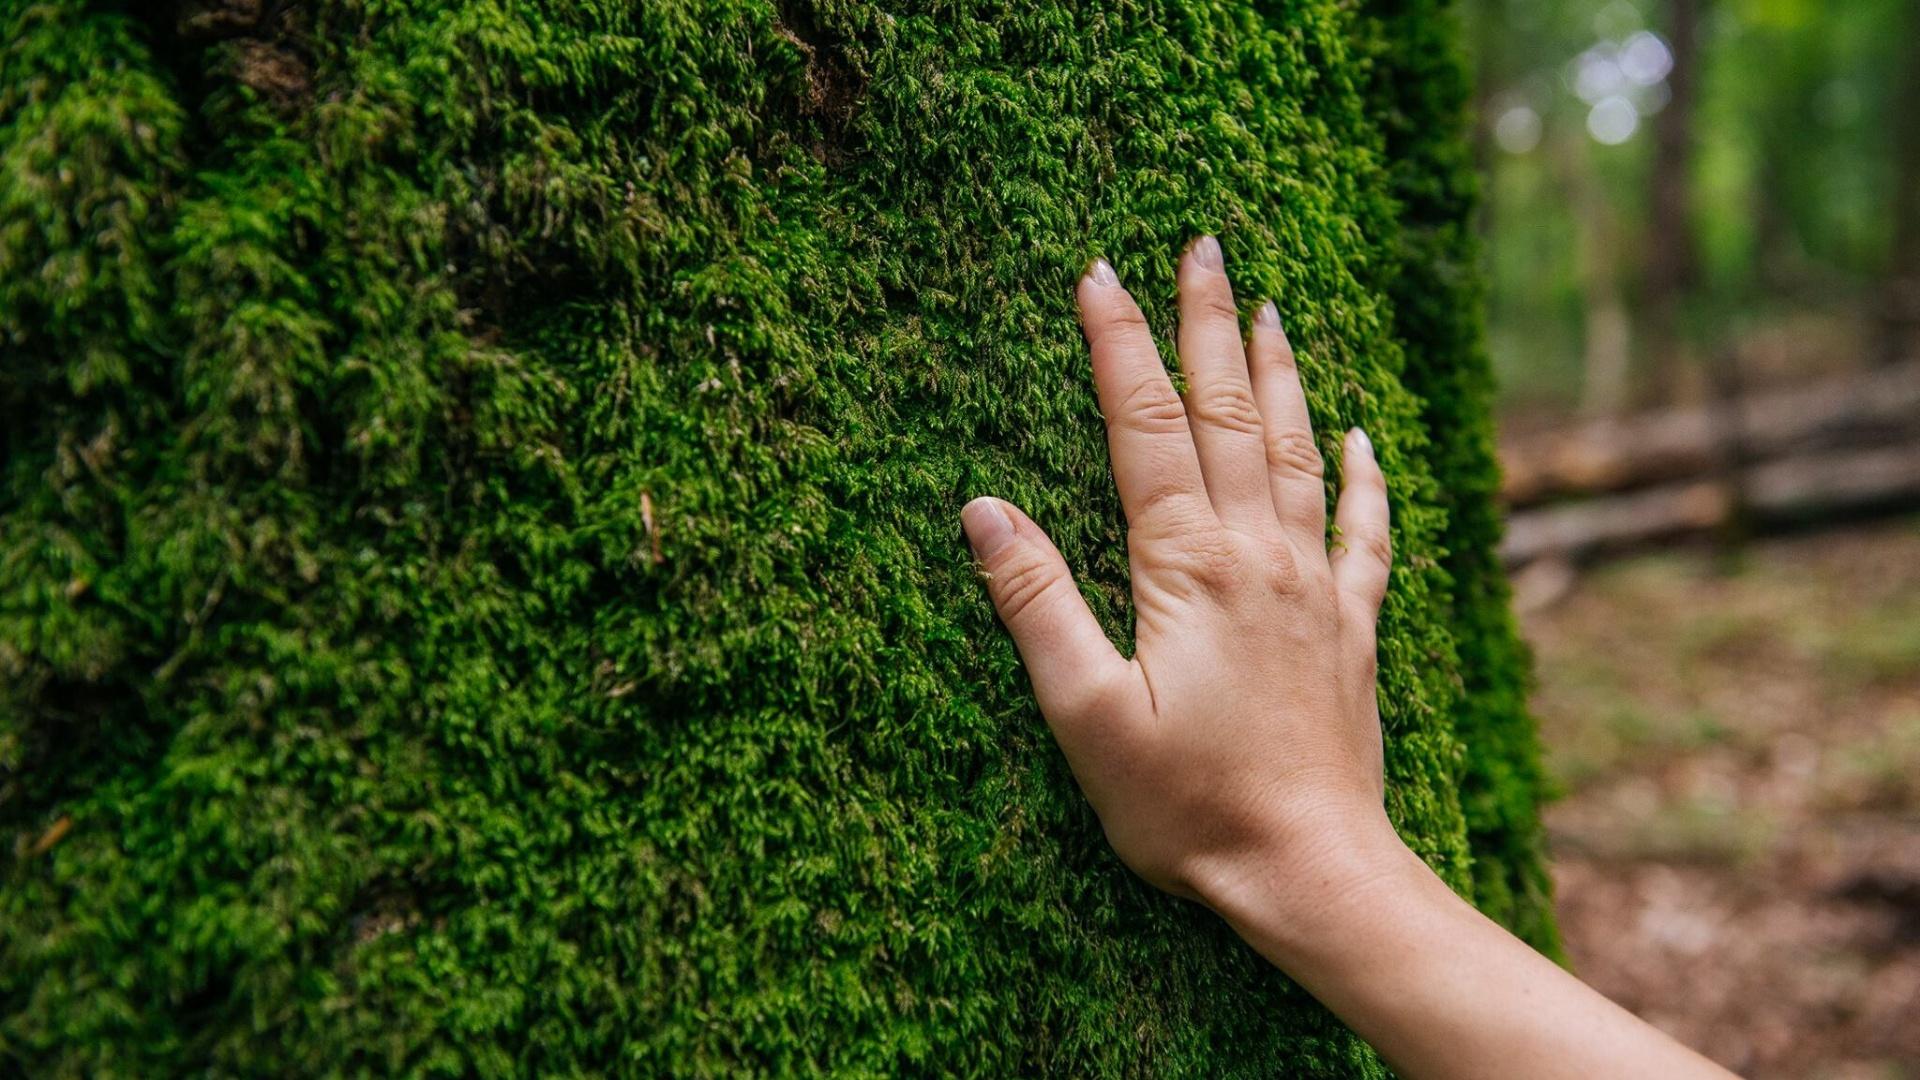 mana-atinge-copac-doru-oprisan-1920x1080